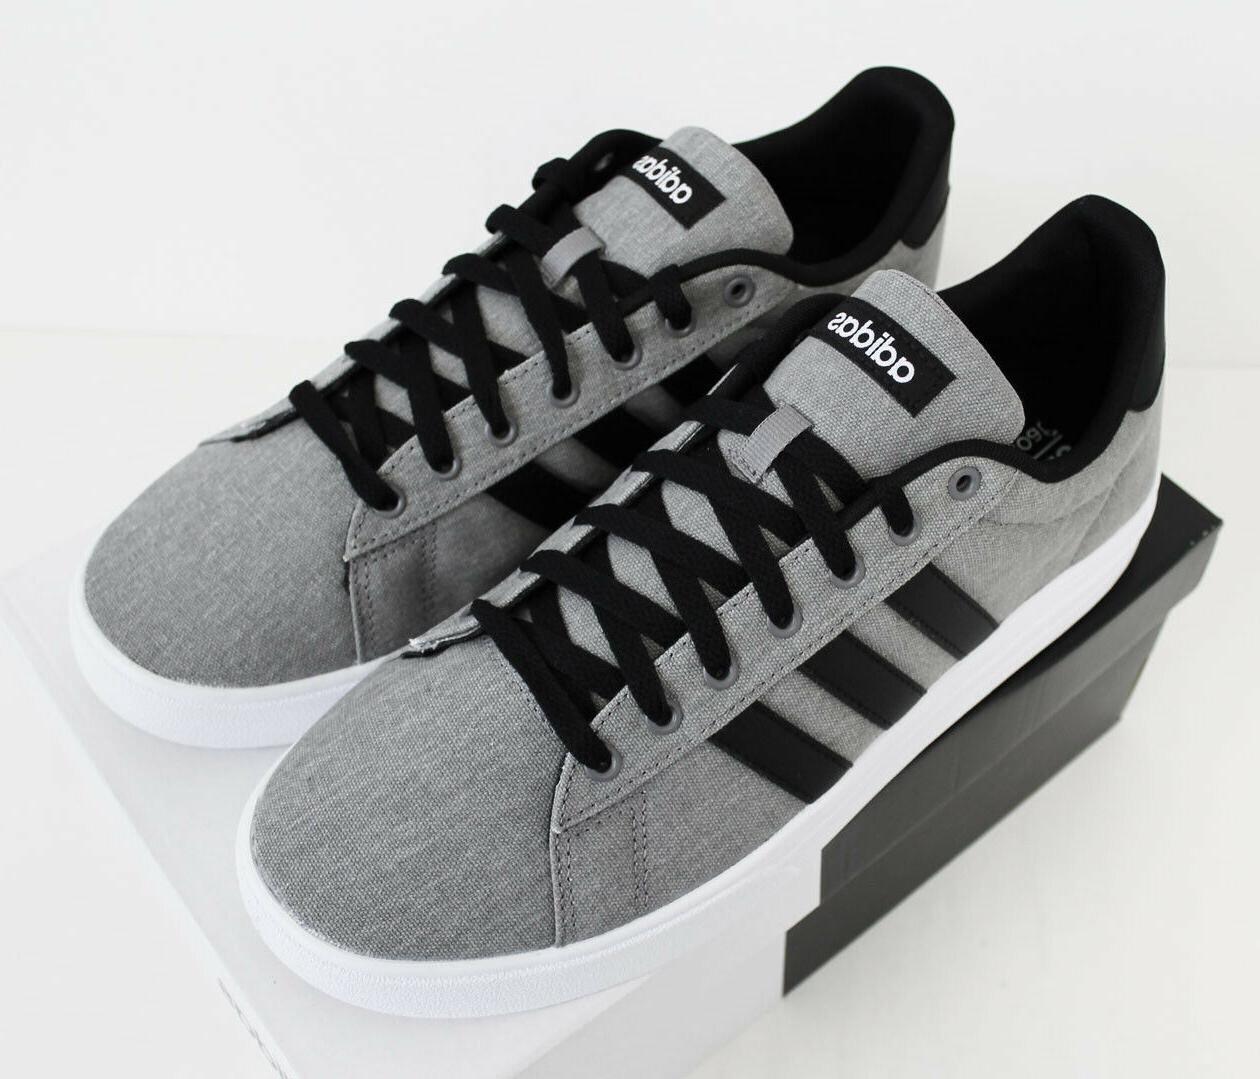 NIB ADIDAS 2.0 Men's Canvas Low Top Skateboard Sneakers Shoes